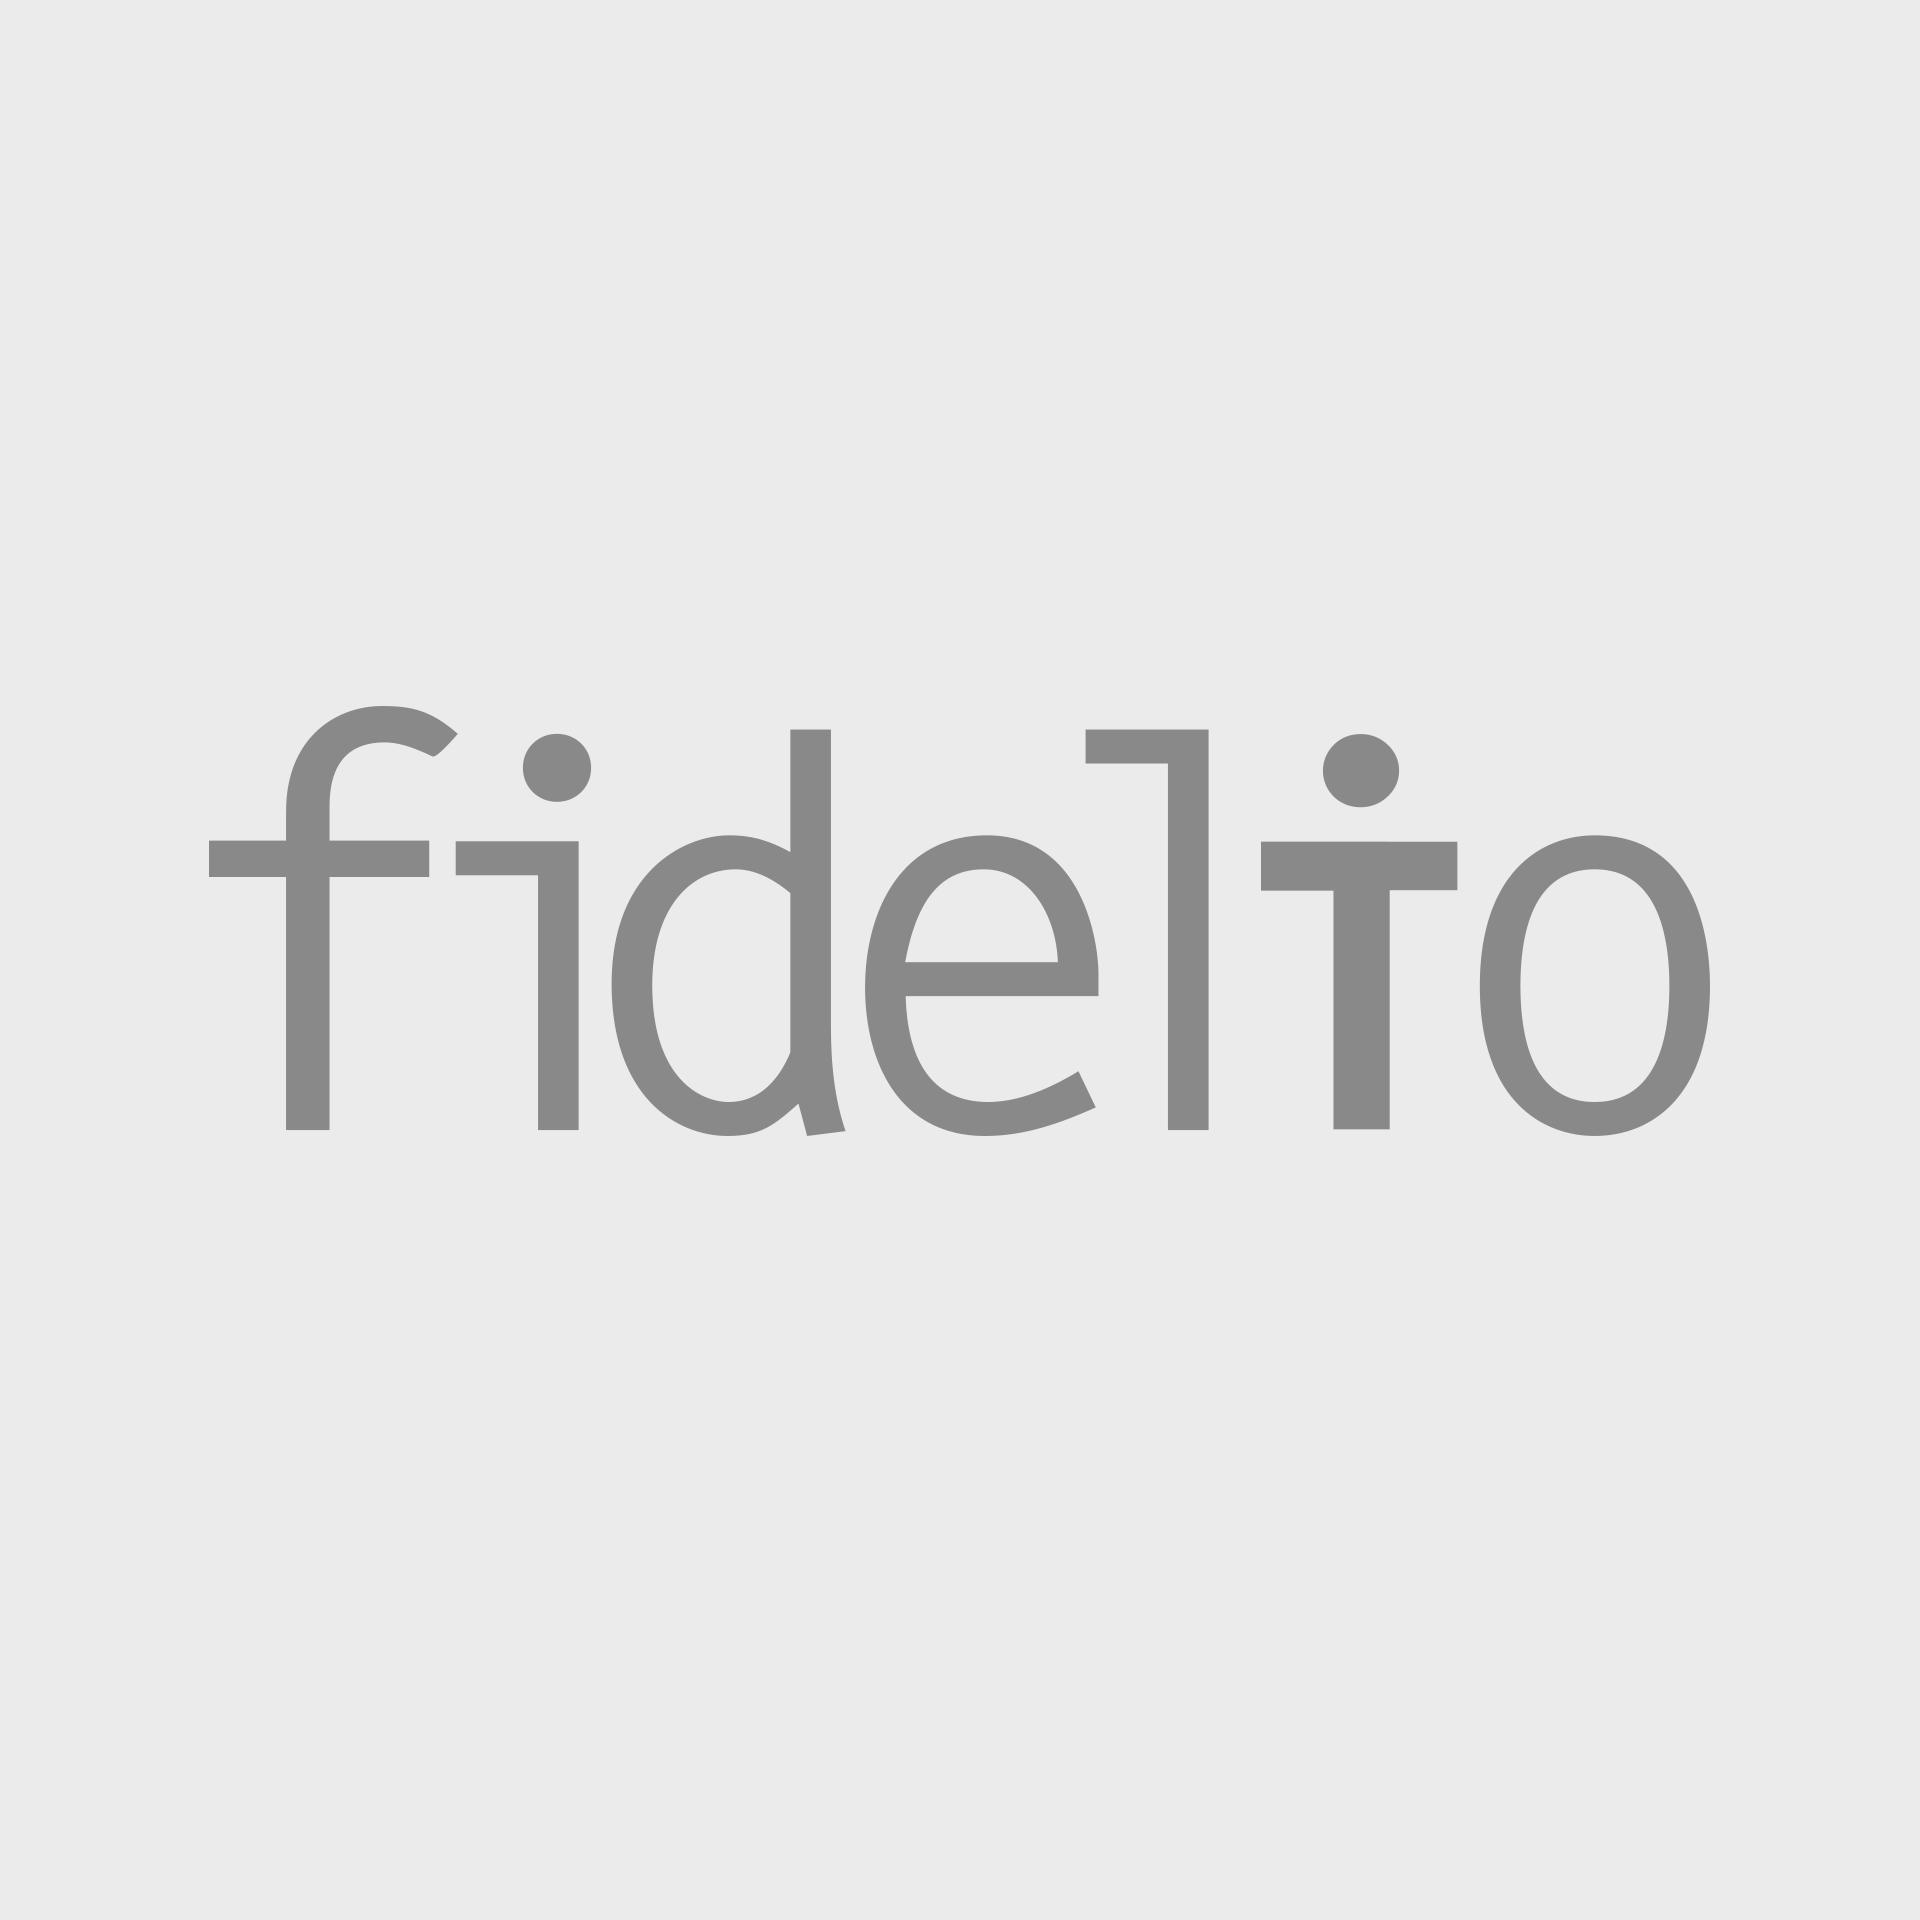 Fidelio Napi Zene – Csajkovszkij: Hattyúk tava - Adagio